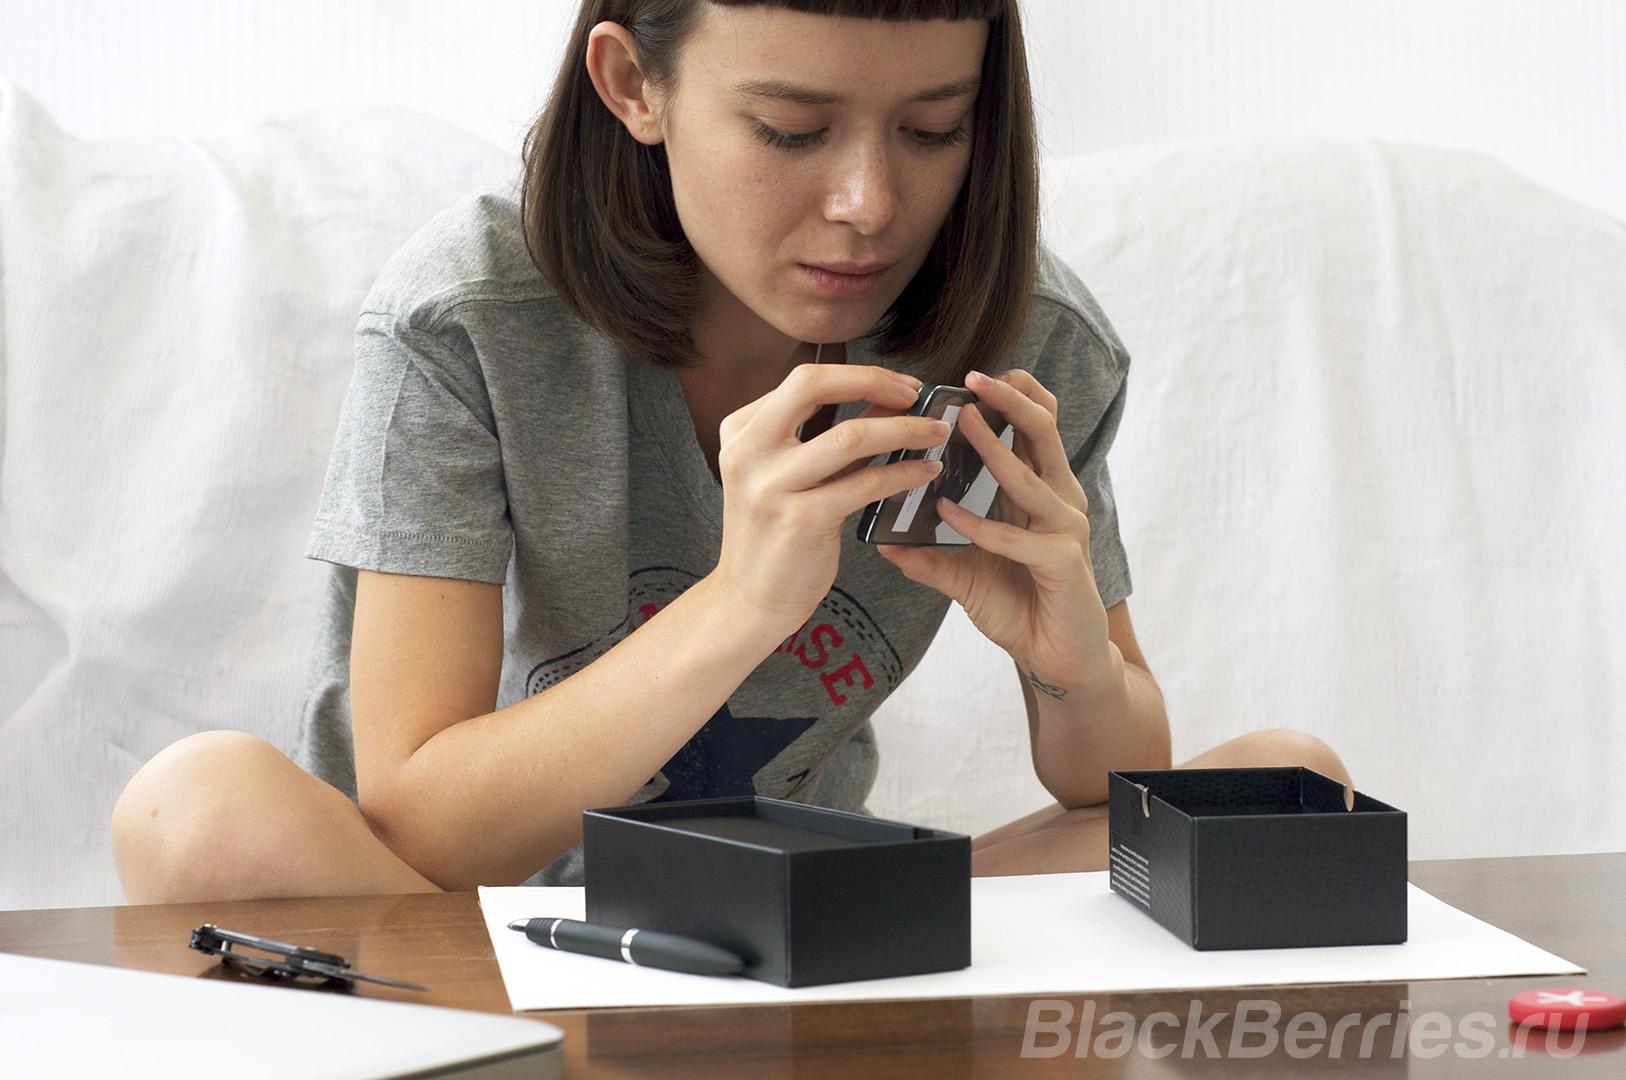 BlackBerry-DTEK50-review-63